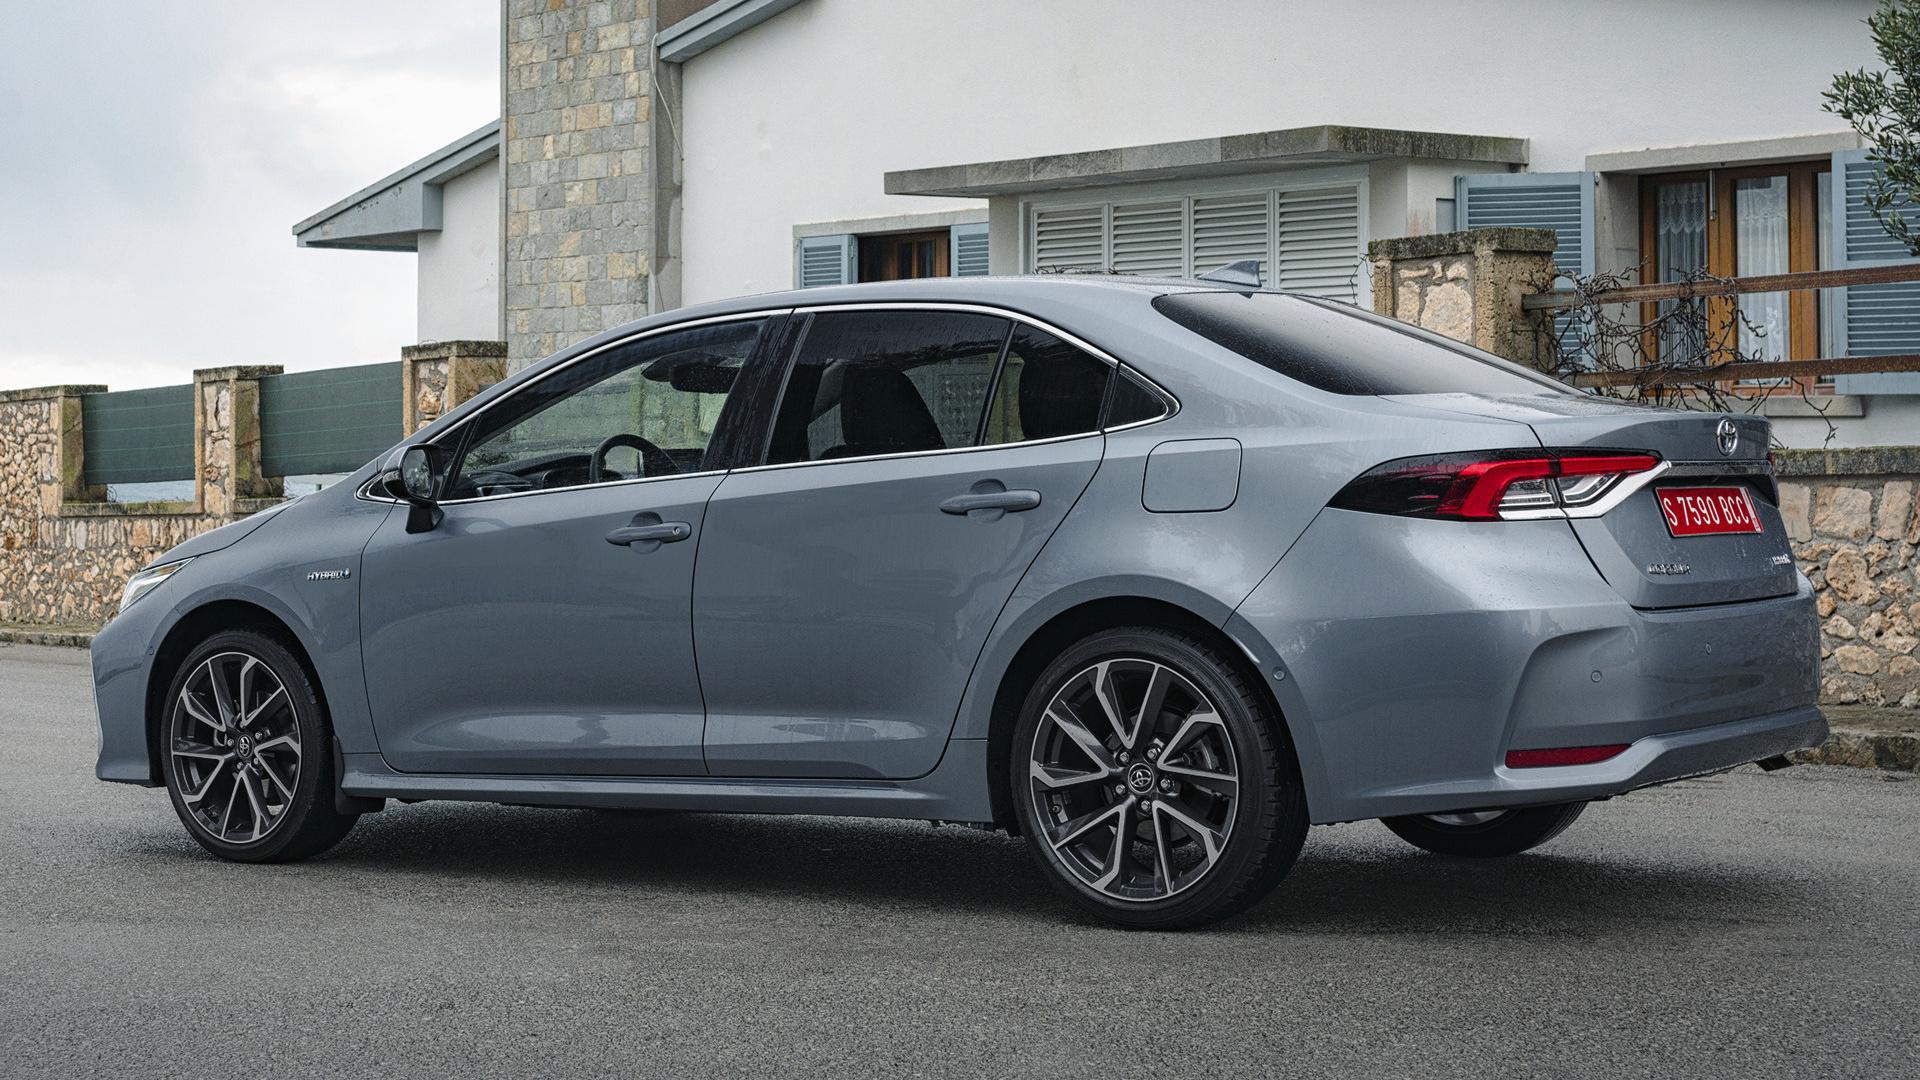 2019 Toyota Corolla Sedan Hybrid Wallpapers And Hd